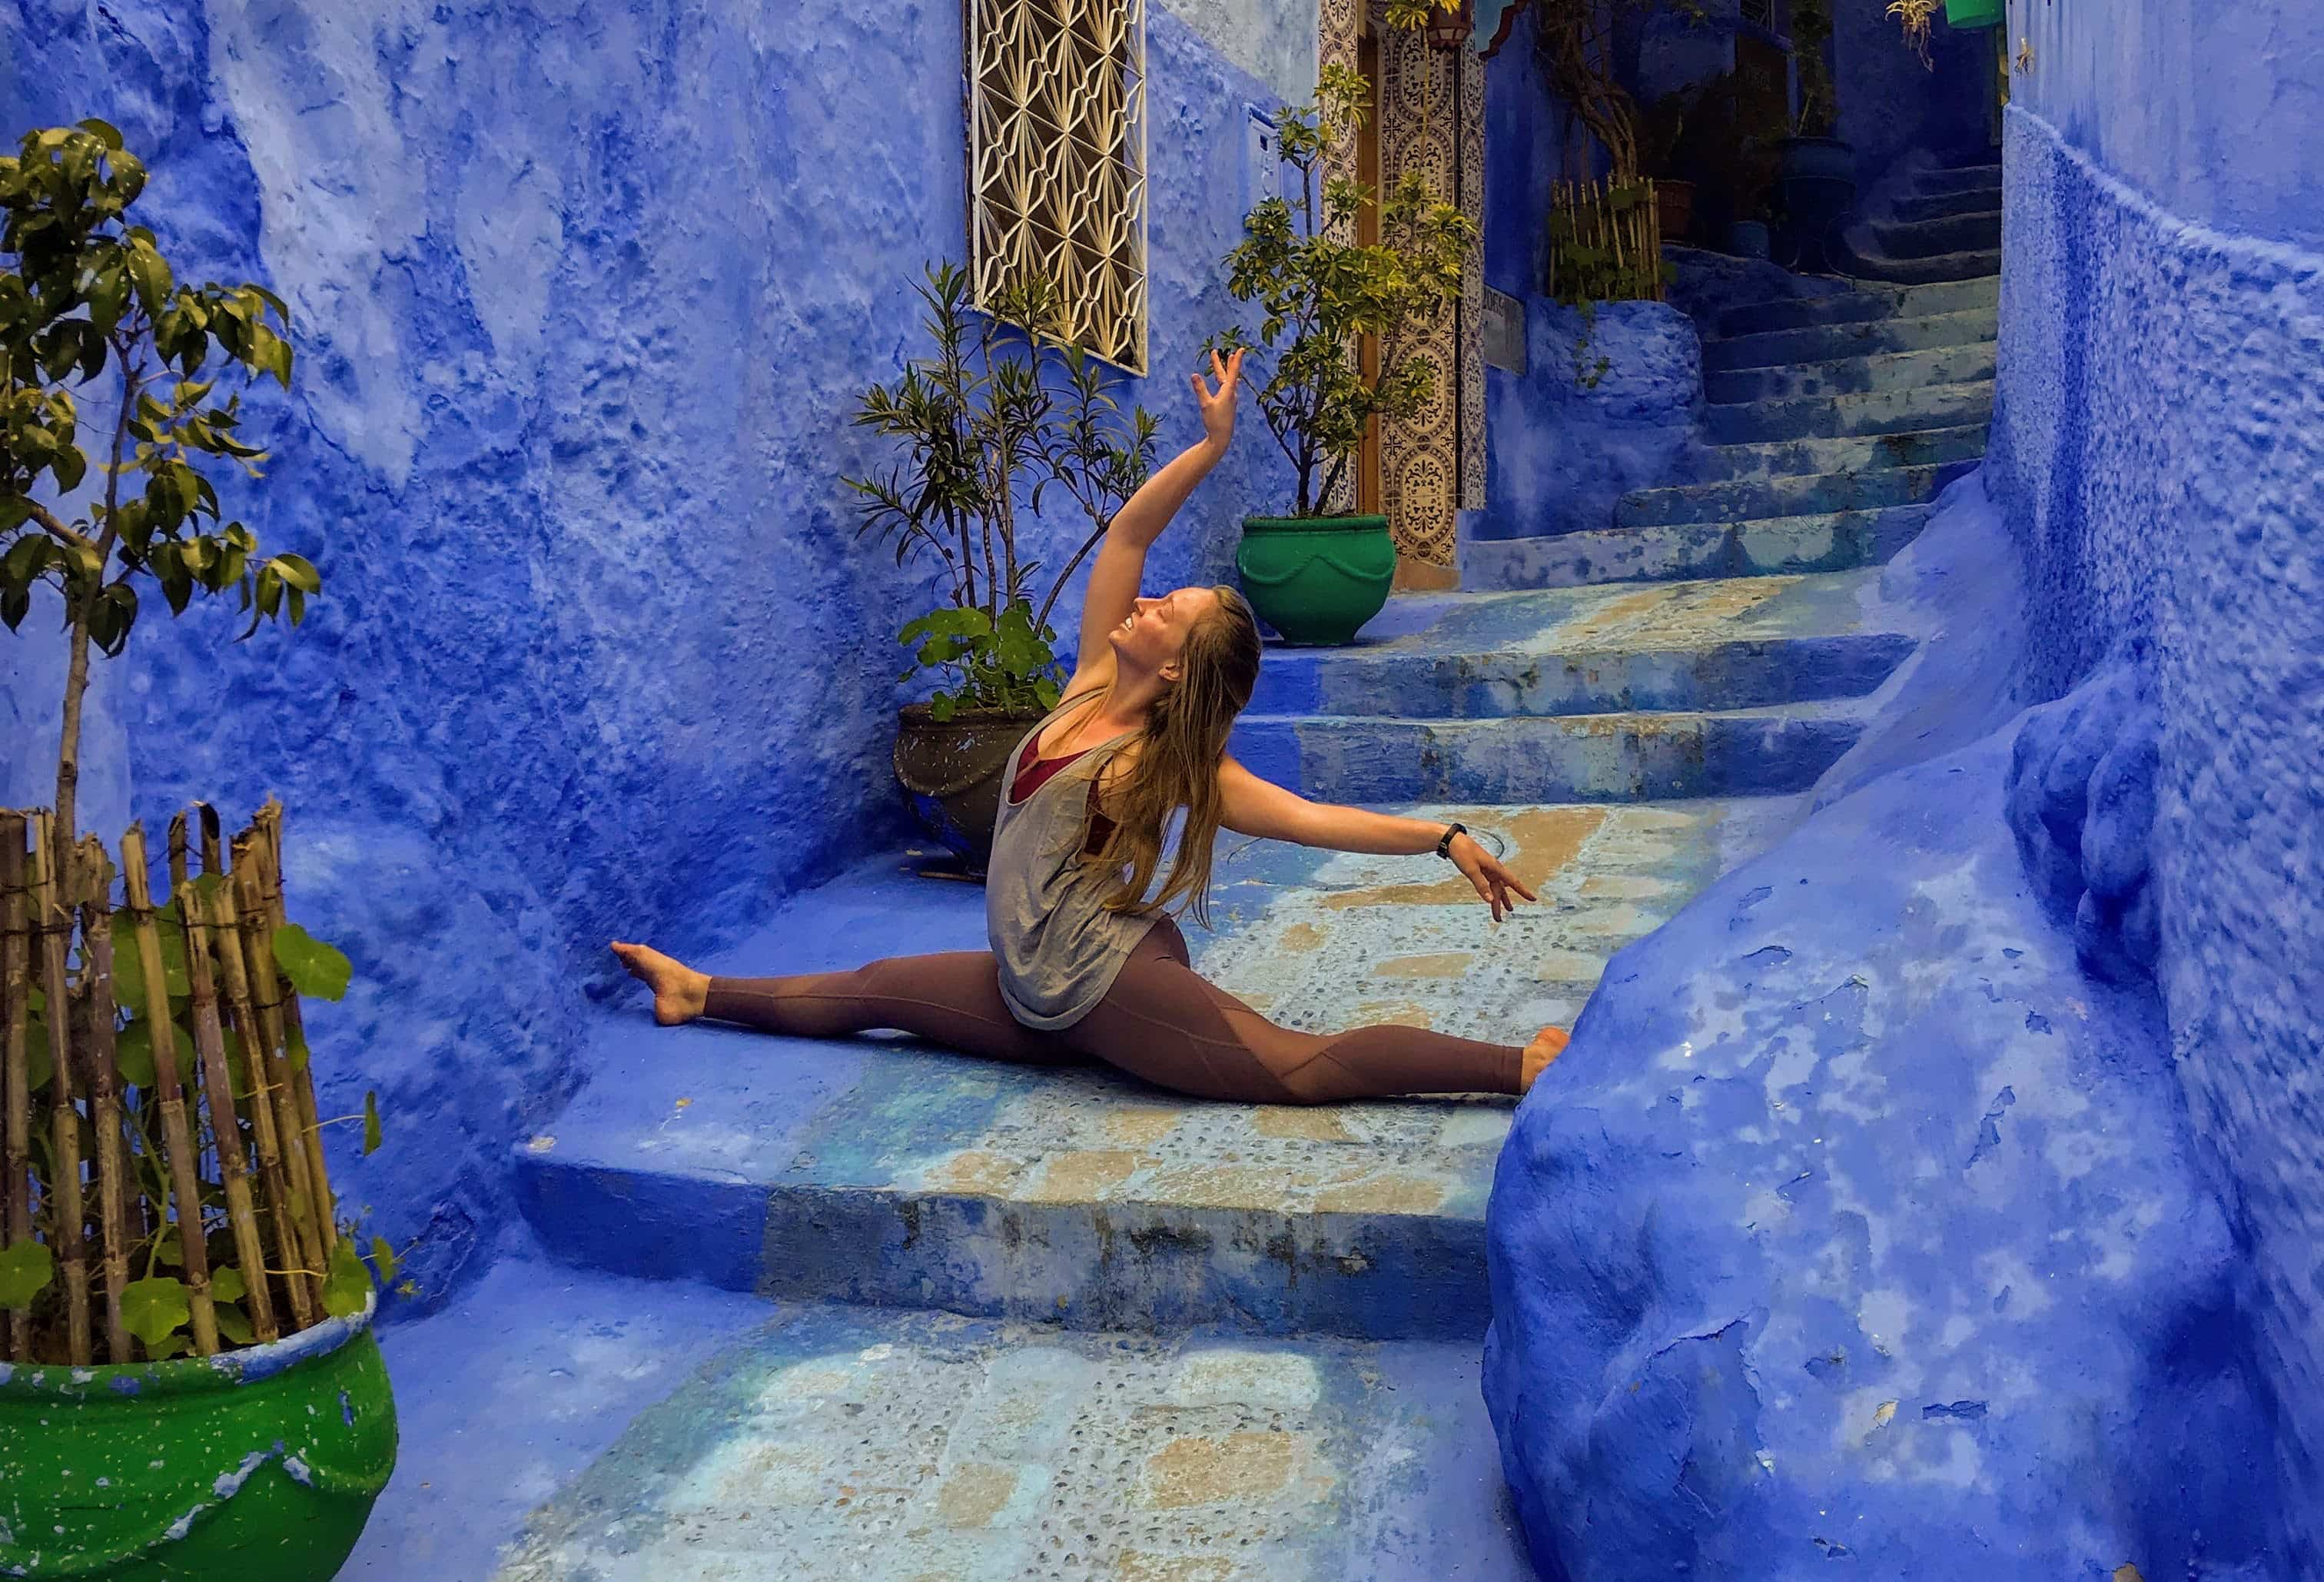 Brittney Martinson in Chefchaouen, Morocco